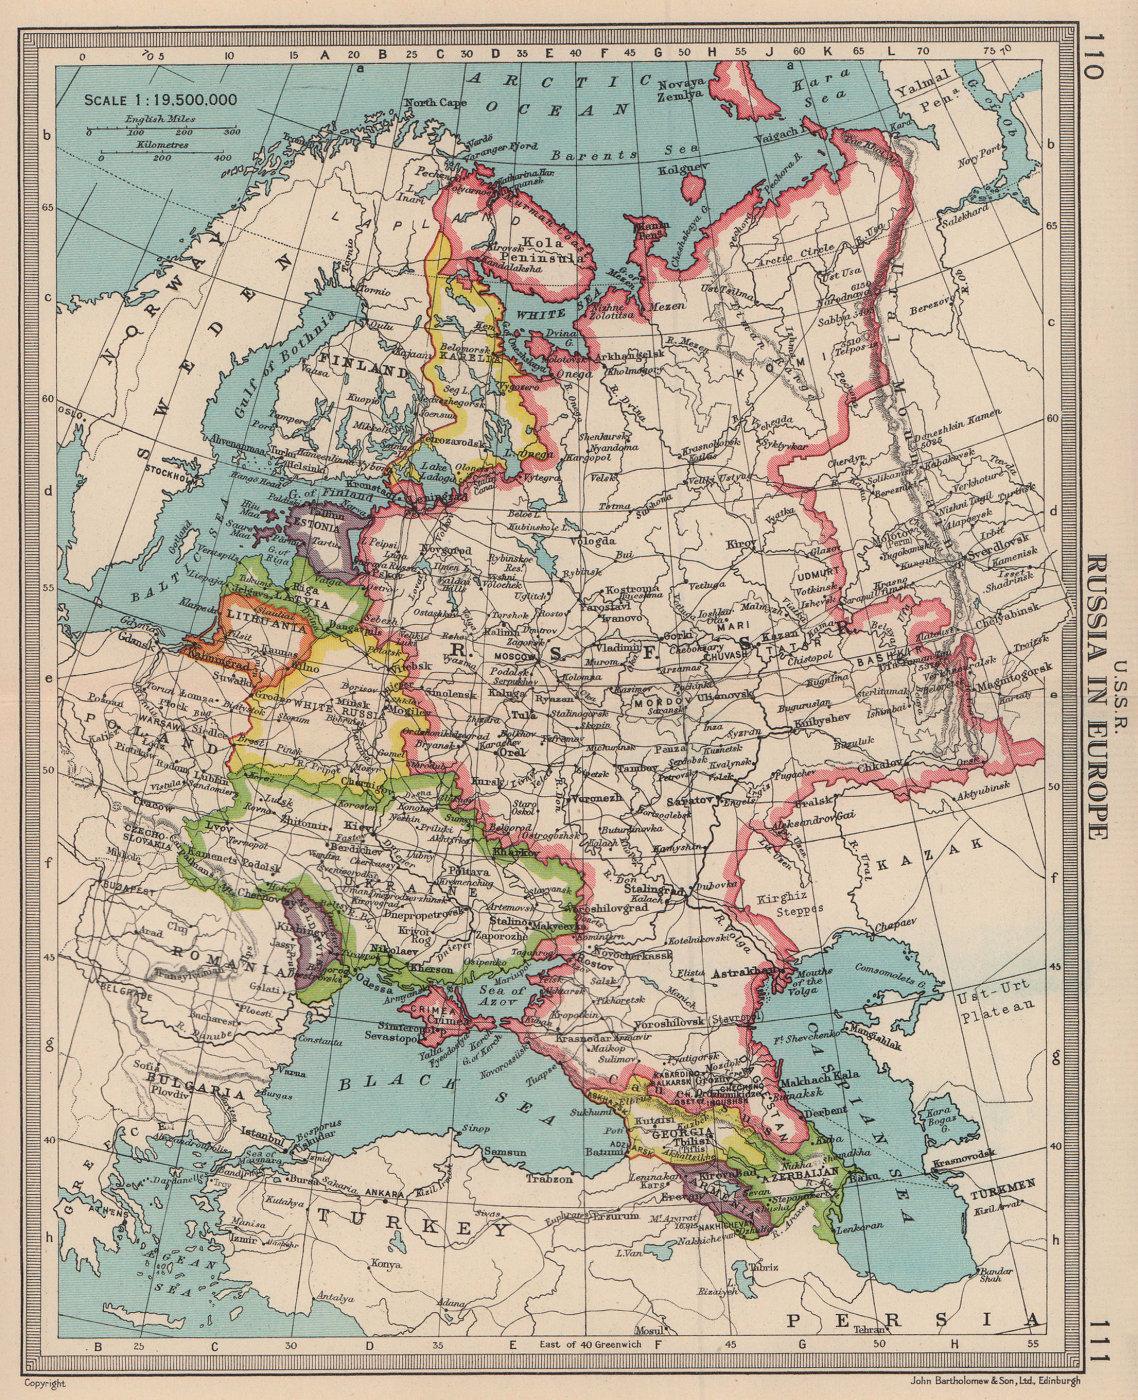 USSR. Ukraine Karelia Baltics White Russia. Russian Crimea. BARTHOLOMEW 1949 map